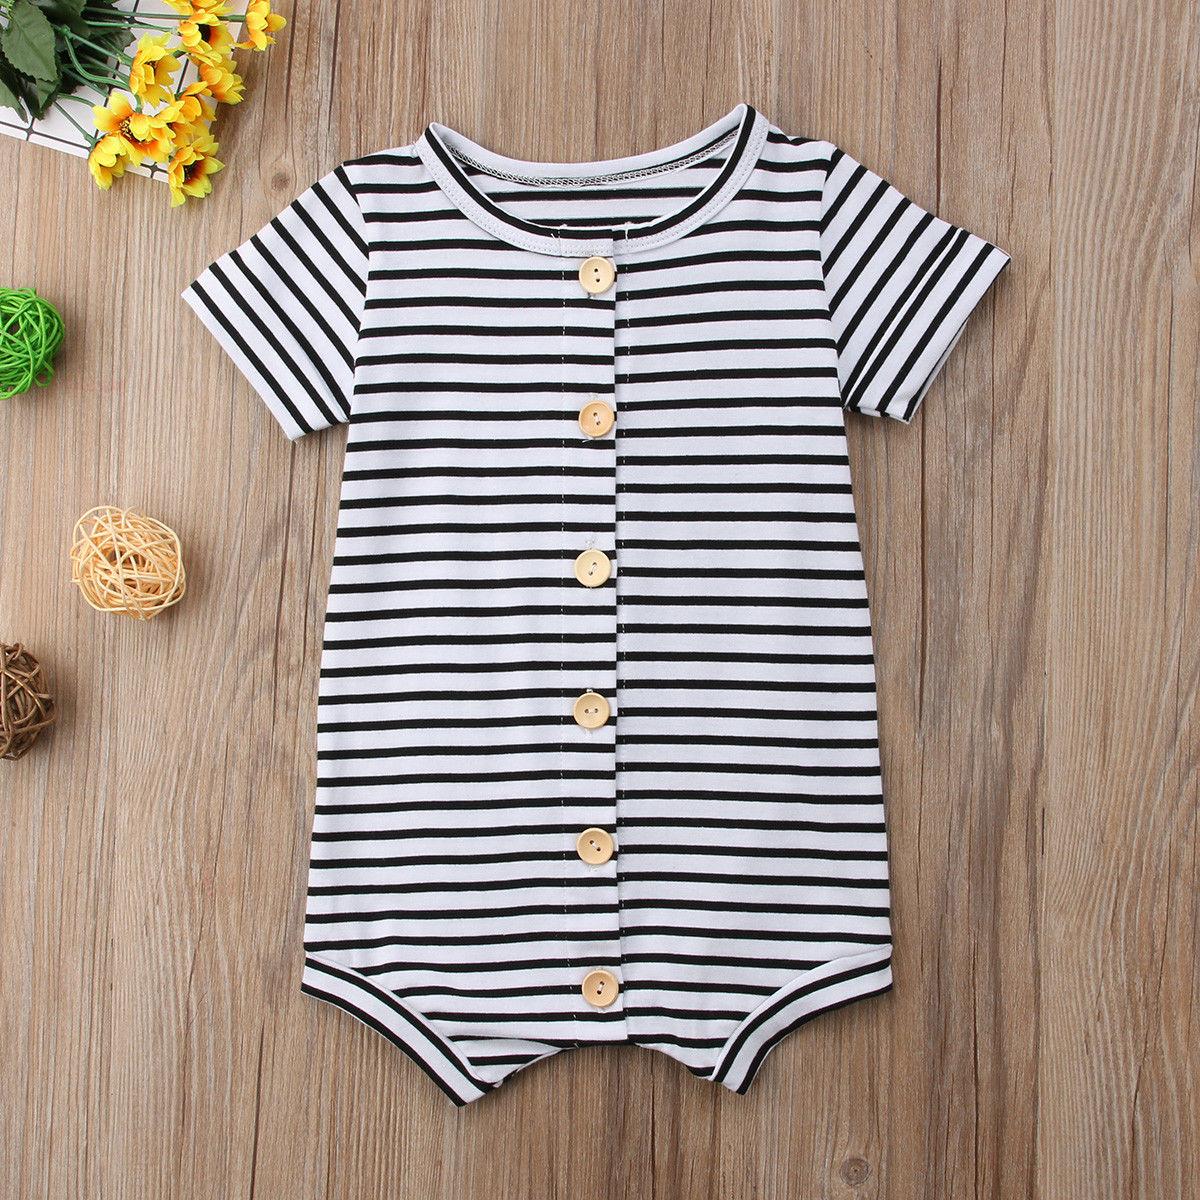 Toddler Baby Kids Boy Girl Short Sleeve Button Romper Jumpsuit Infant Bodysuit F